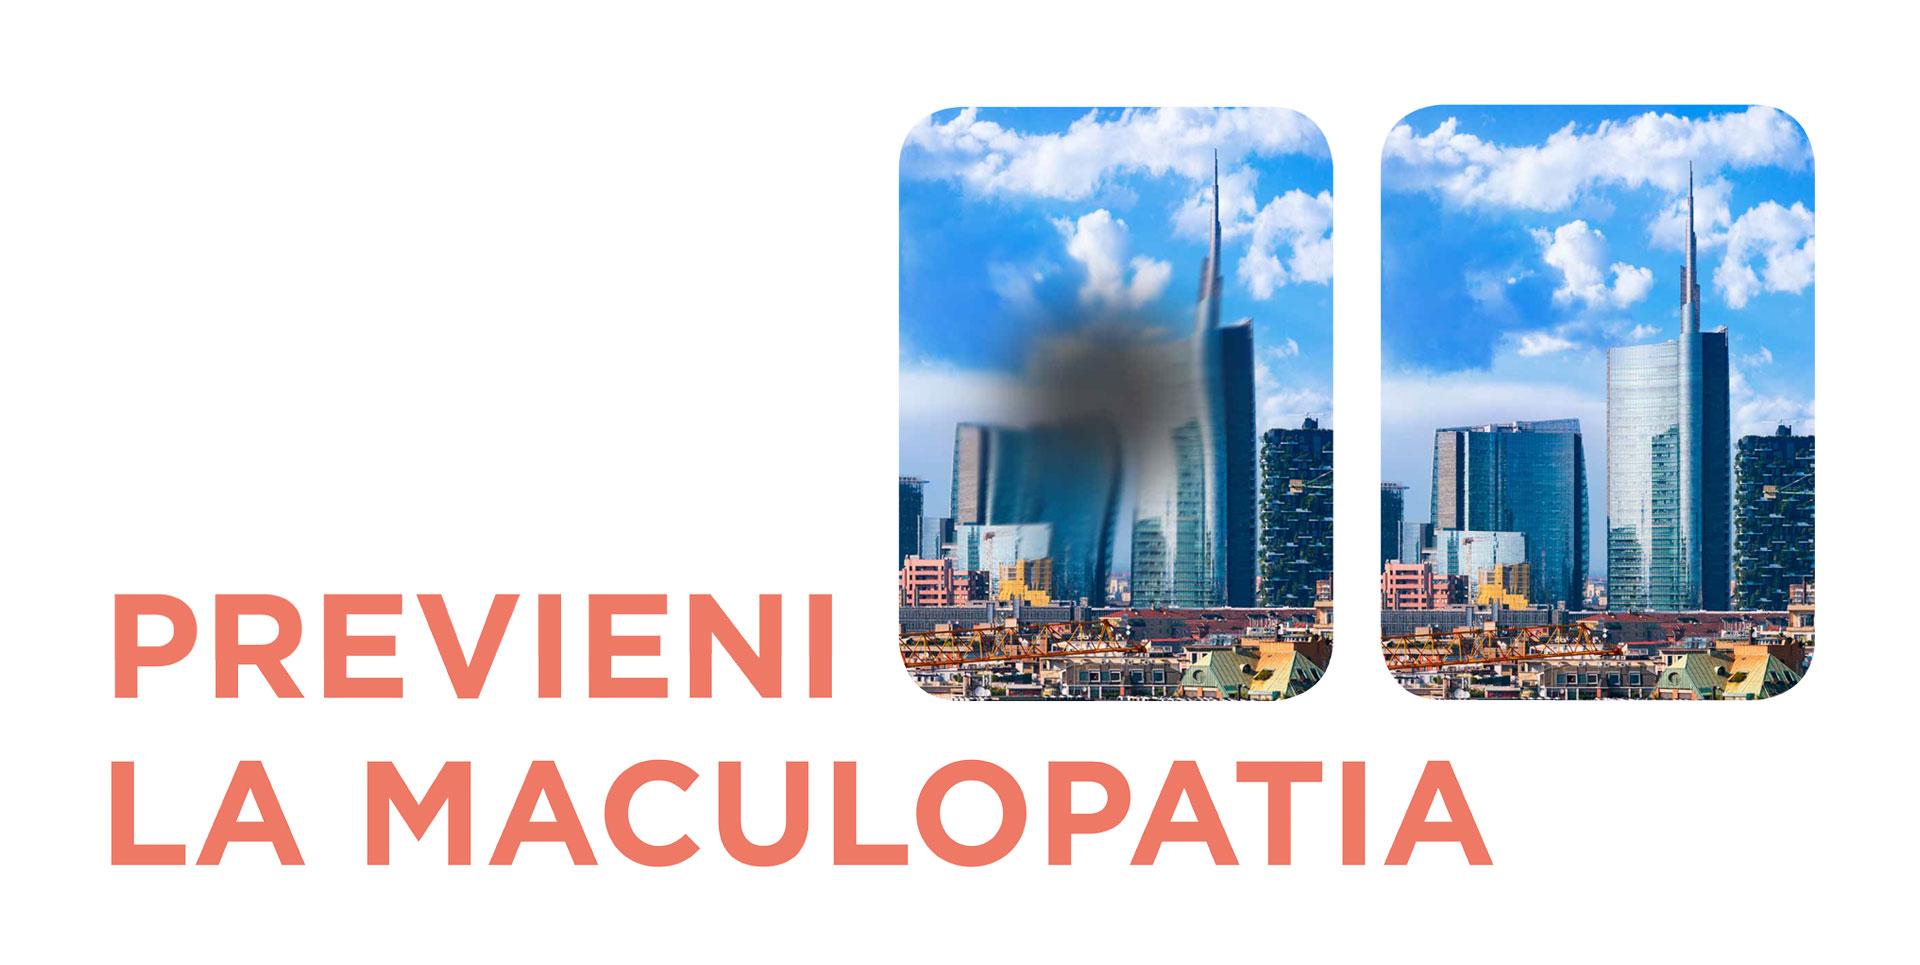 Maculopatia: Prima Campagna Nazionale di prevenzione e diagnosi